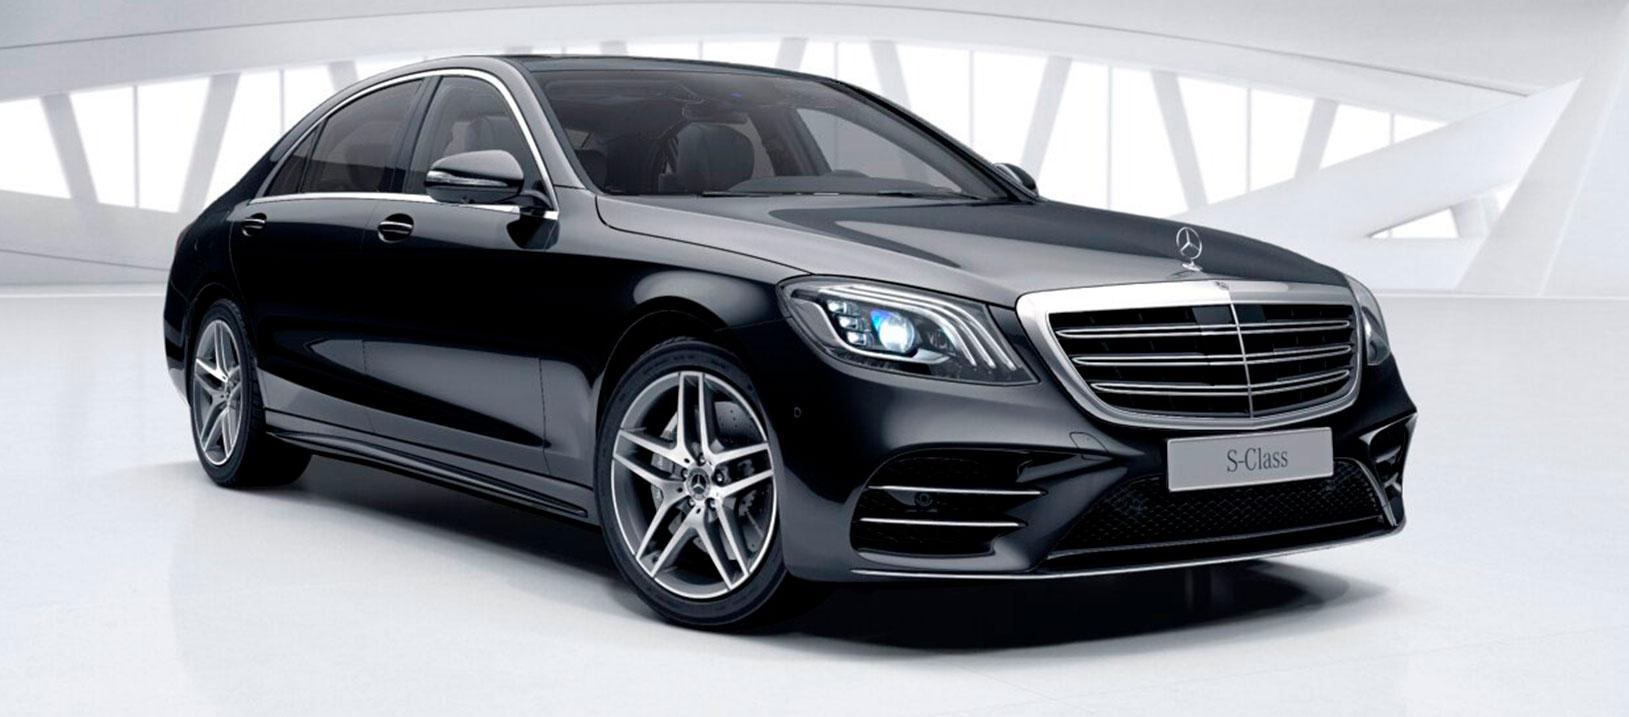 Mercedes-Benz S 350 d 4MATIC long 52600124